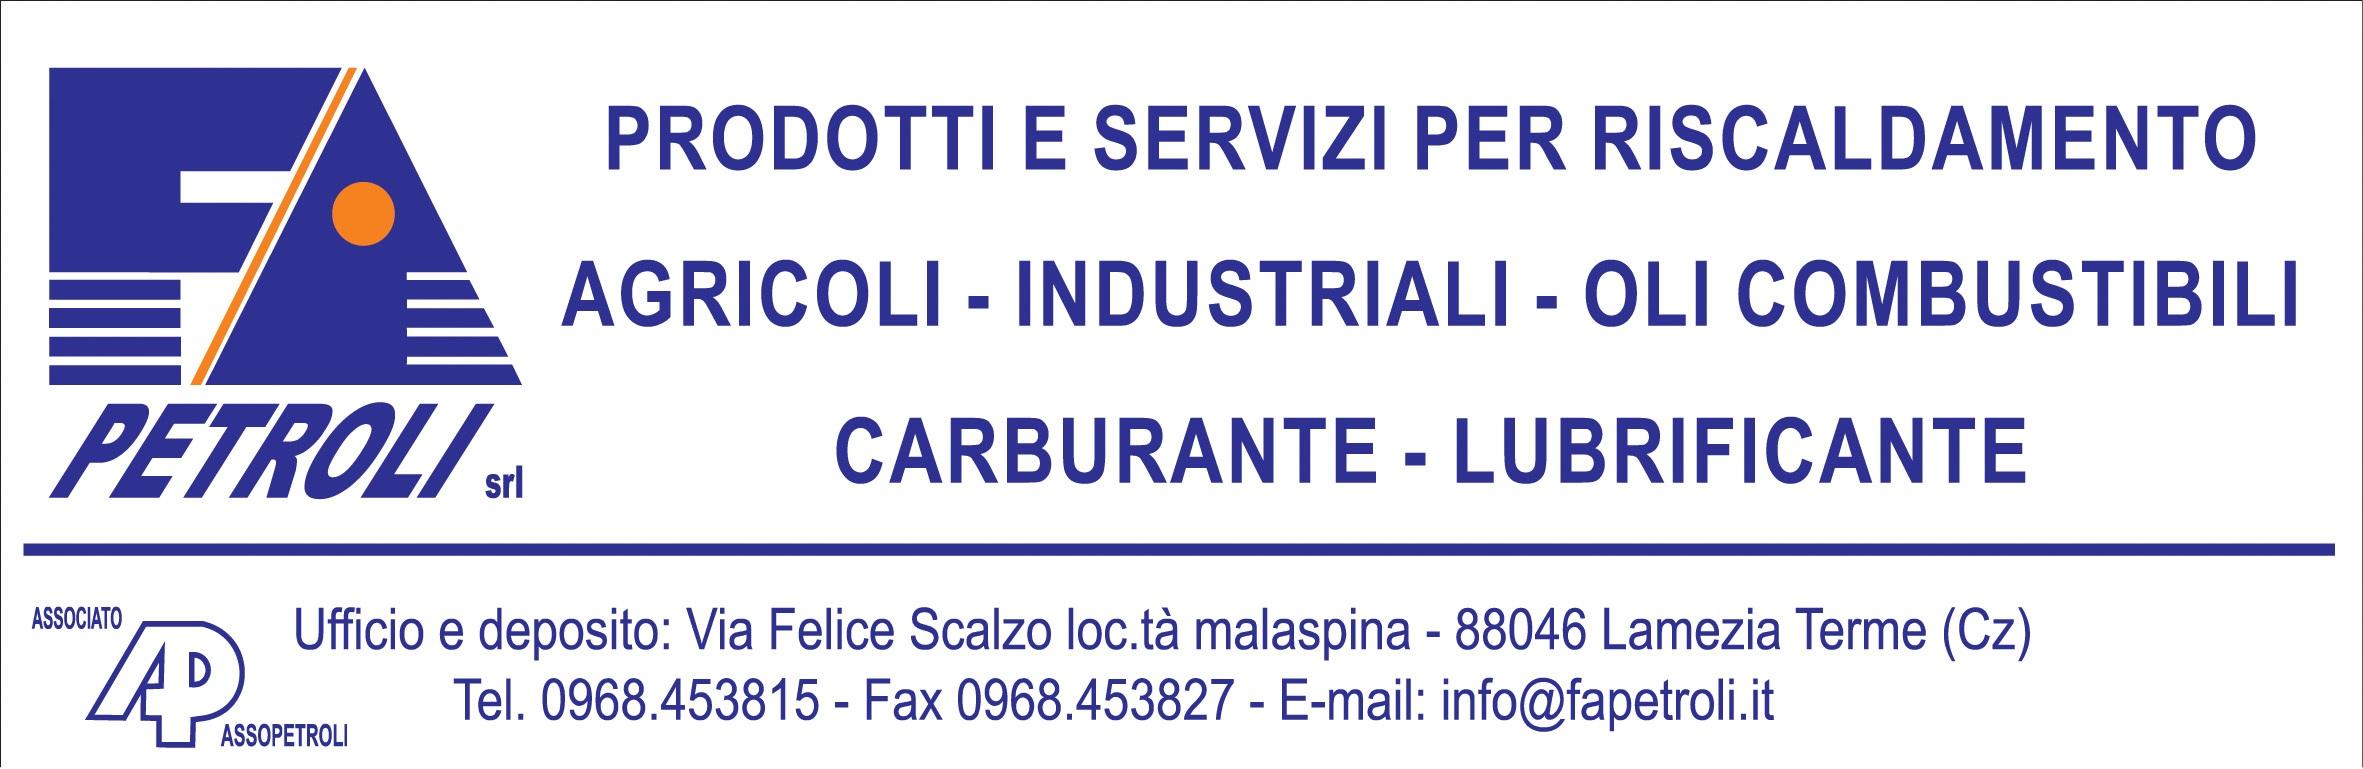 http://usdgimigliano.it/wp-content/uploads/2019/09/fasito.jpg